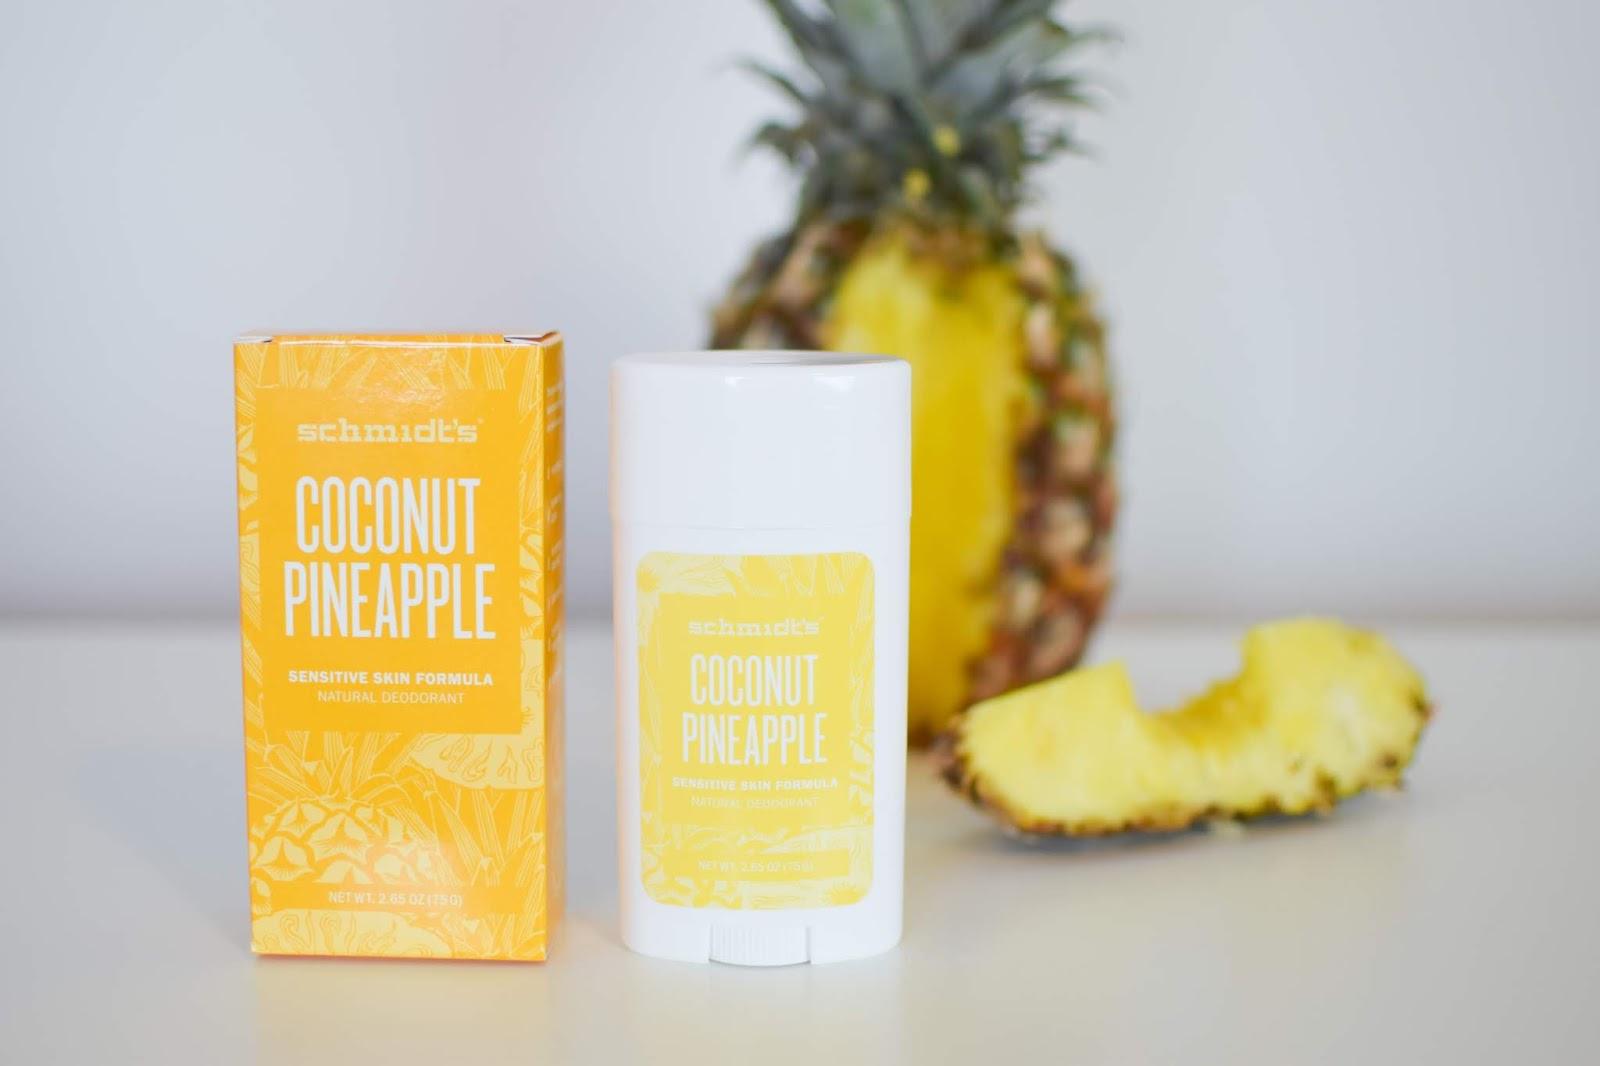 Dezodorant ananás kokos Schmidts Notino